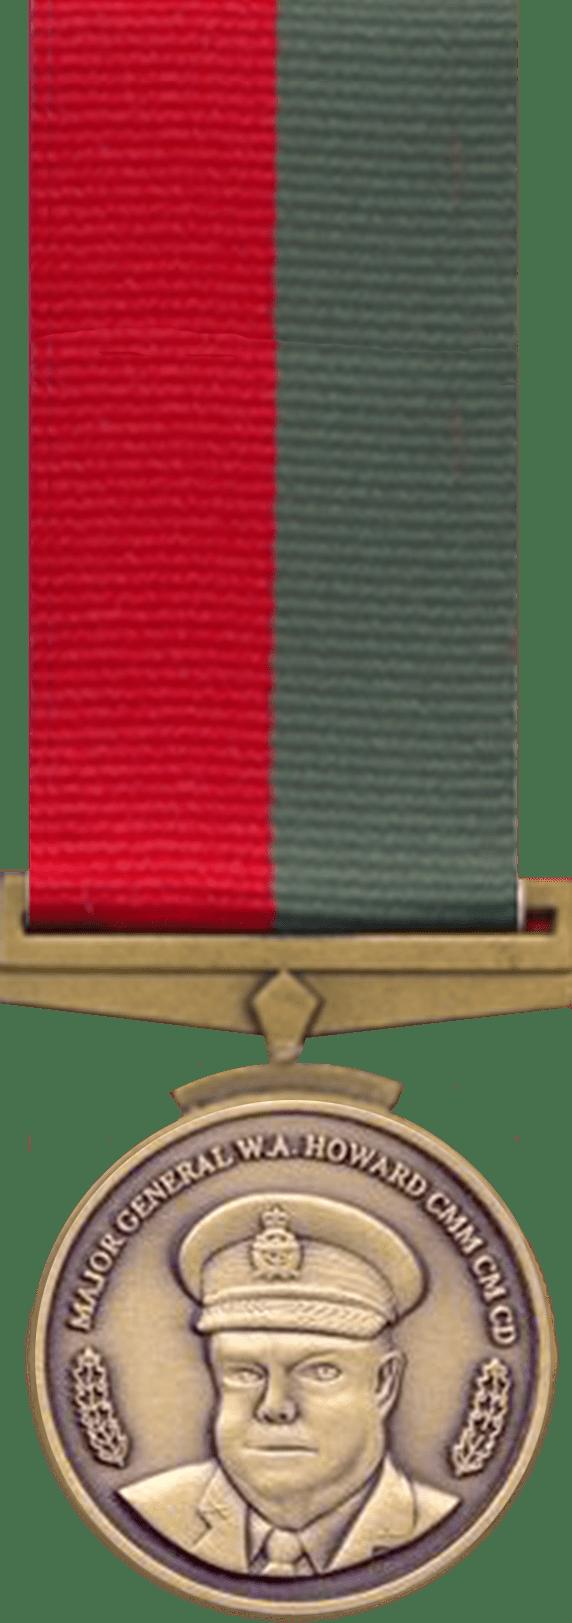 Awards medicine hat army. Clipart diamond medal